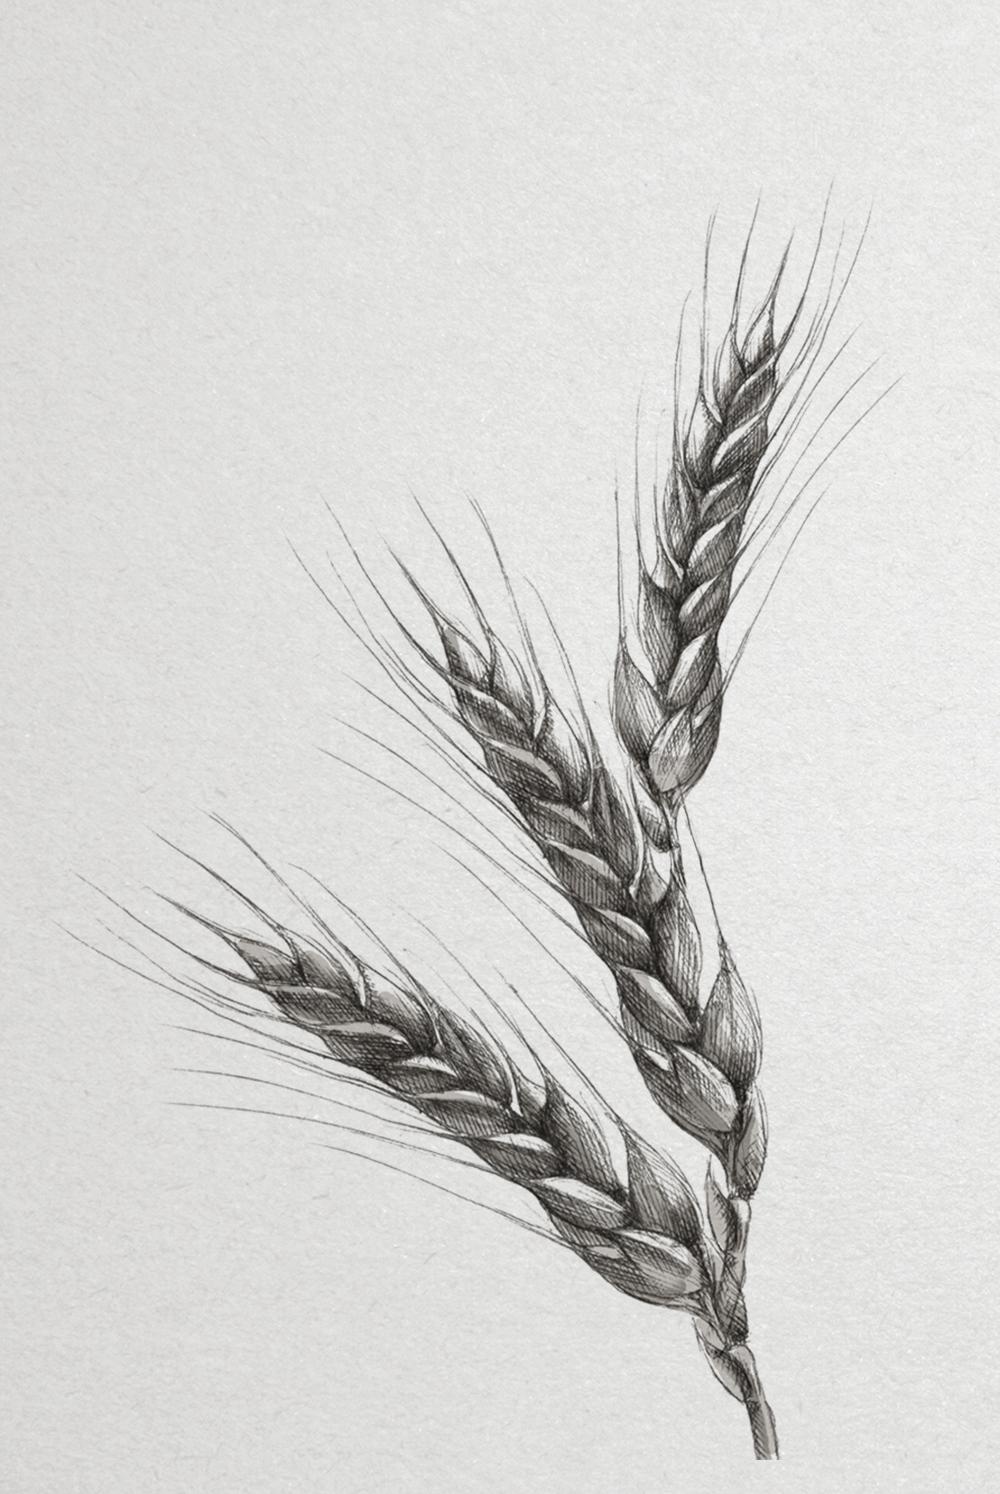 grain_web.jpg